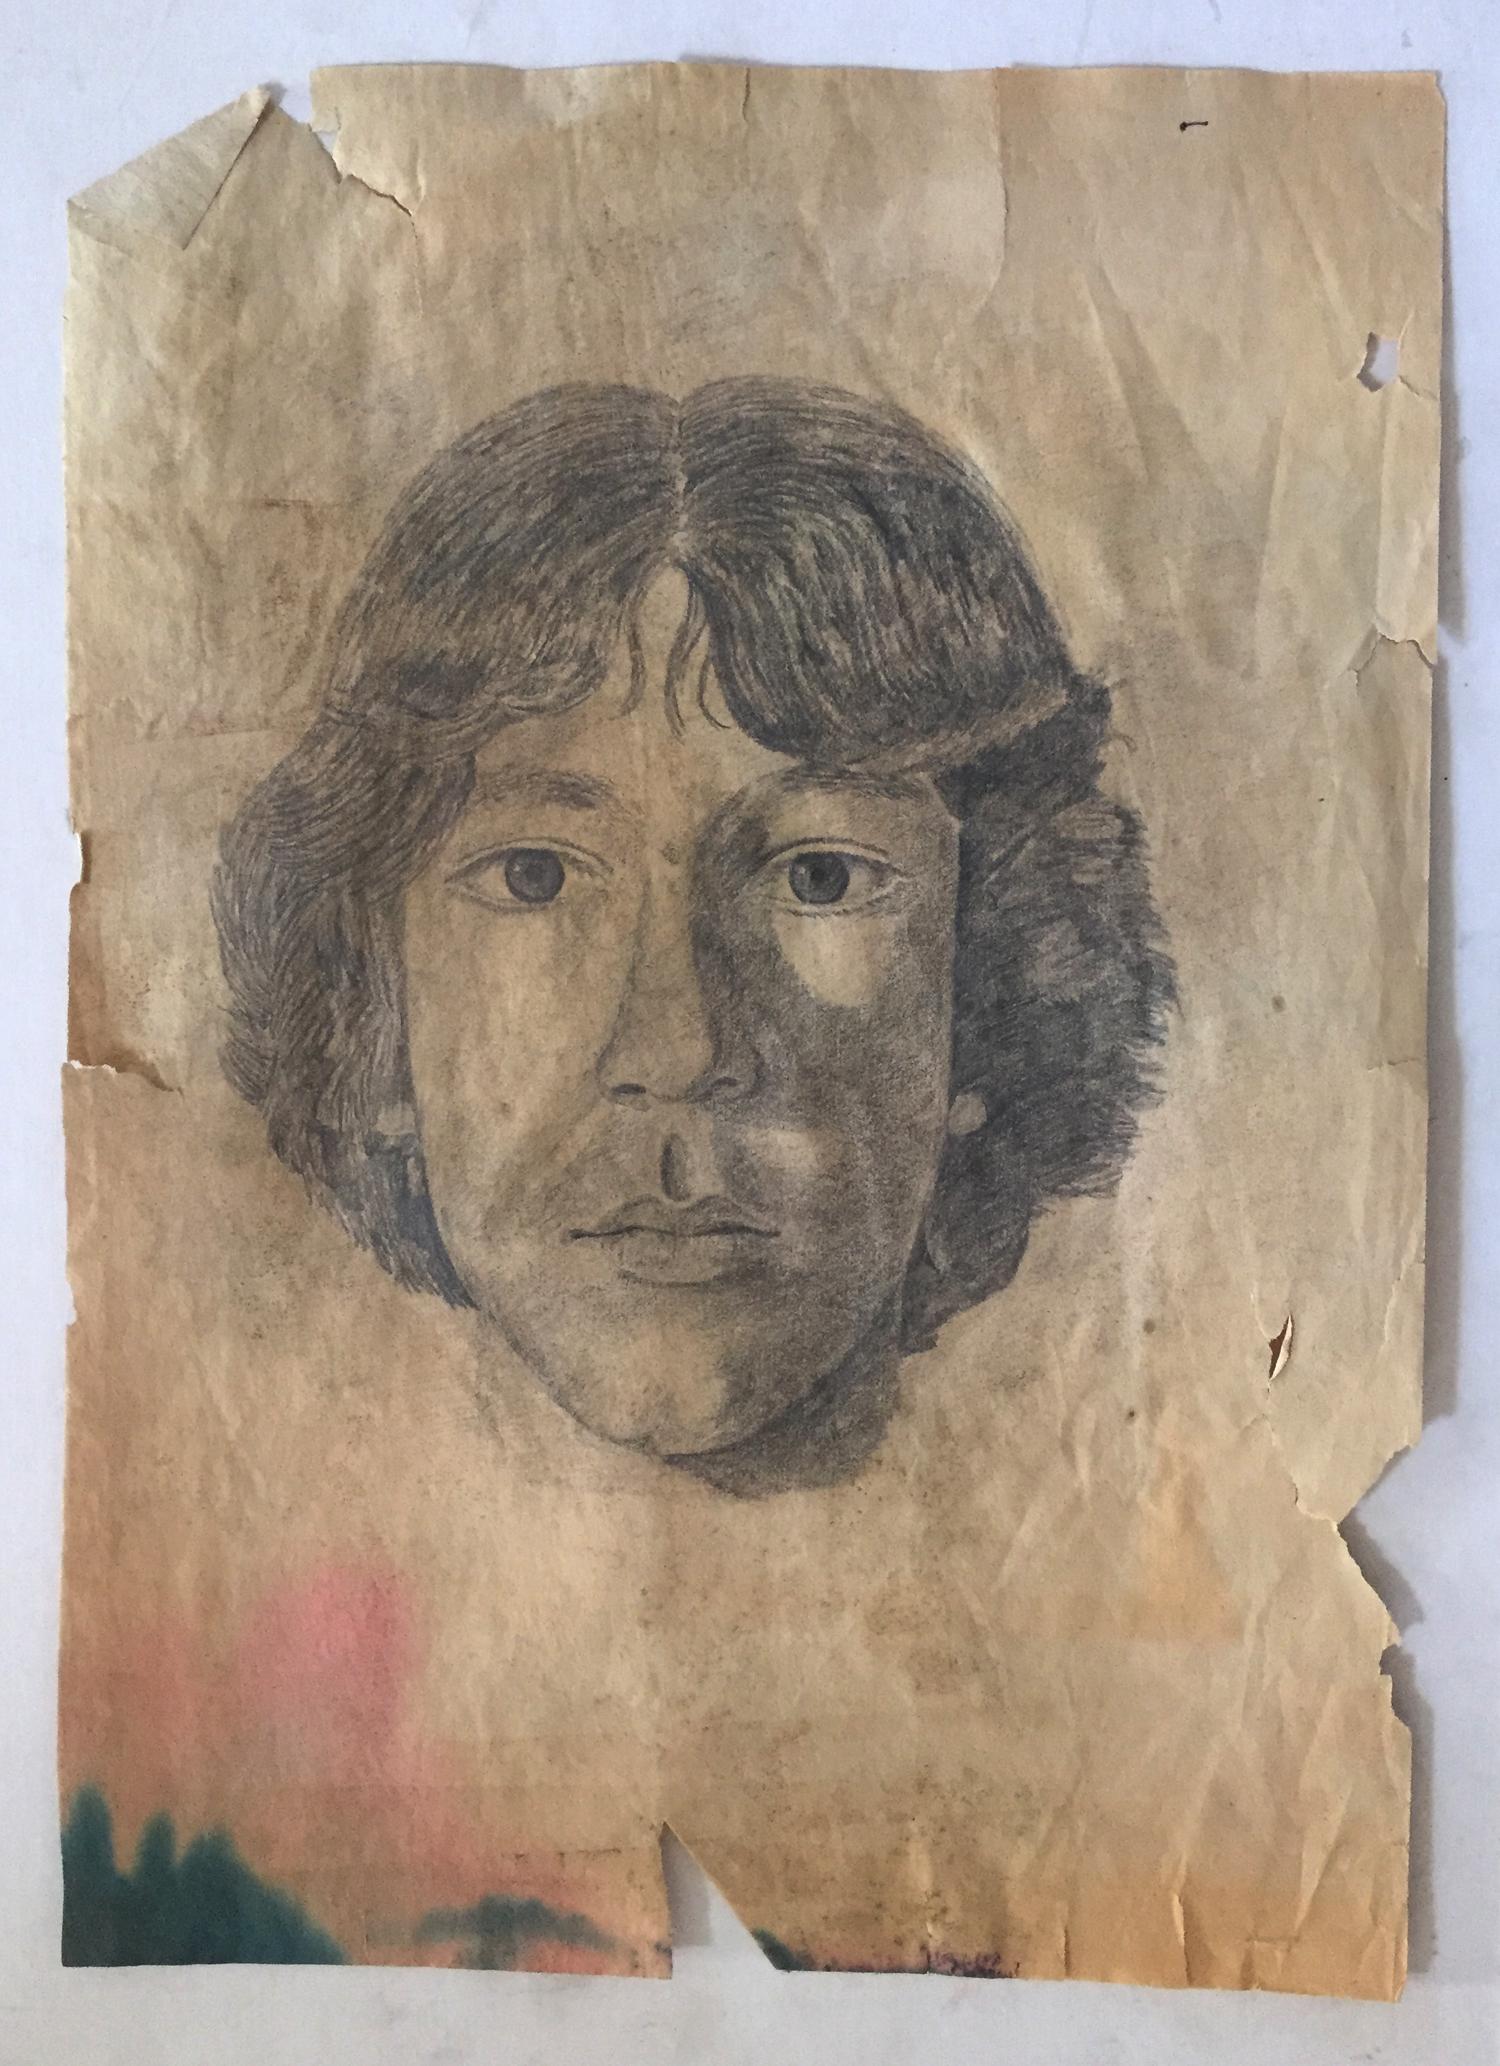 High School Art Class Self Portrait   Pencil on paper. © Jud Burgess 1977